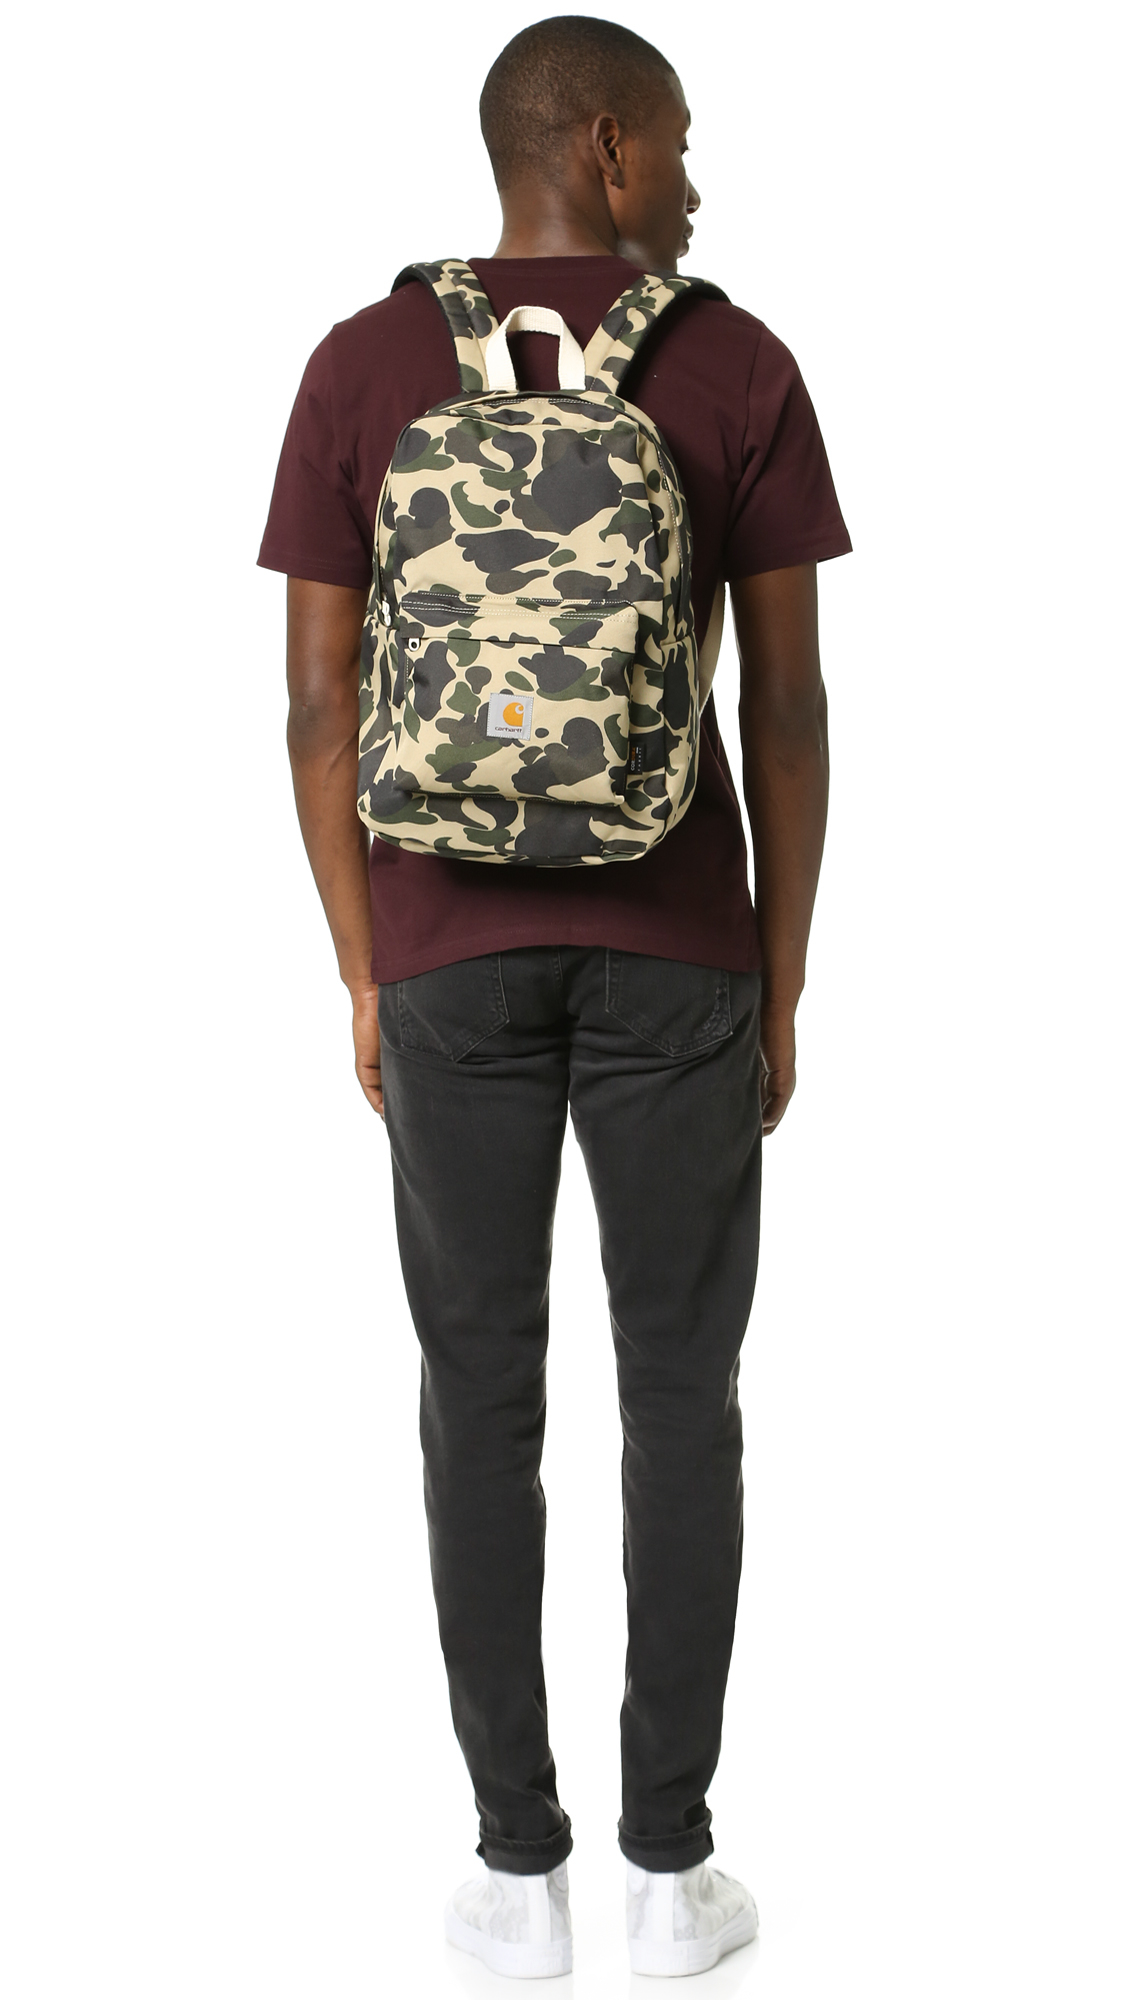 Carhartt WIP Watch Backpack in Green for Men - Lyst